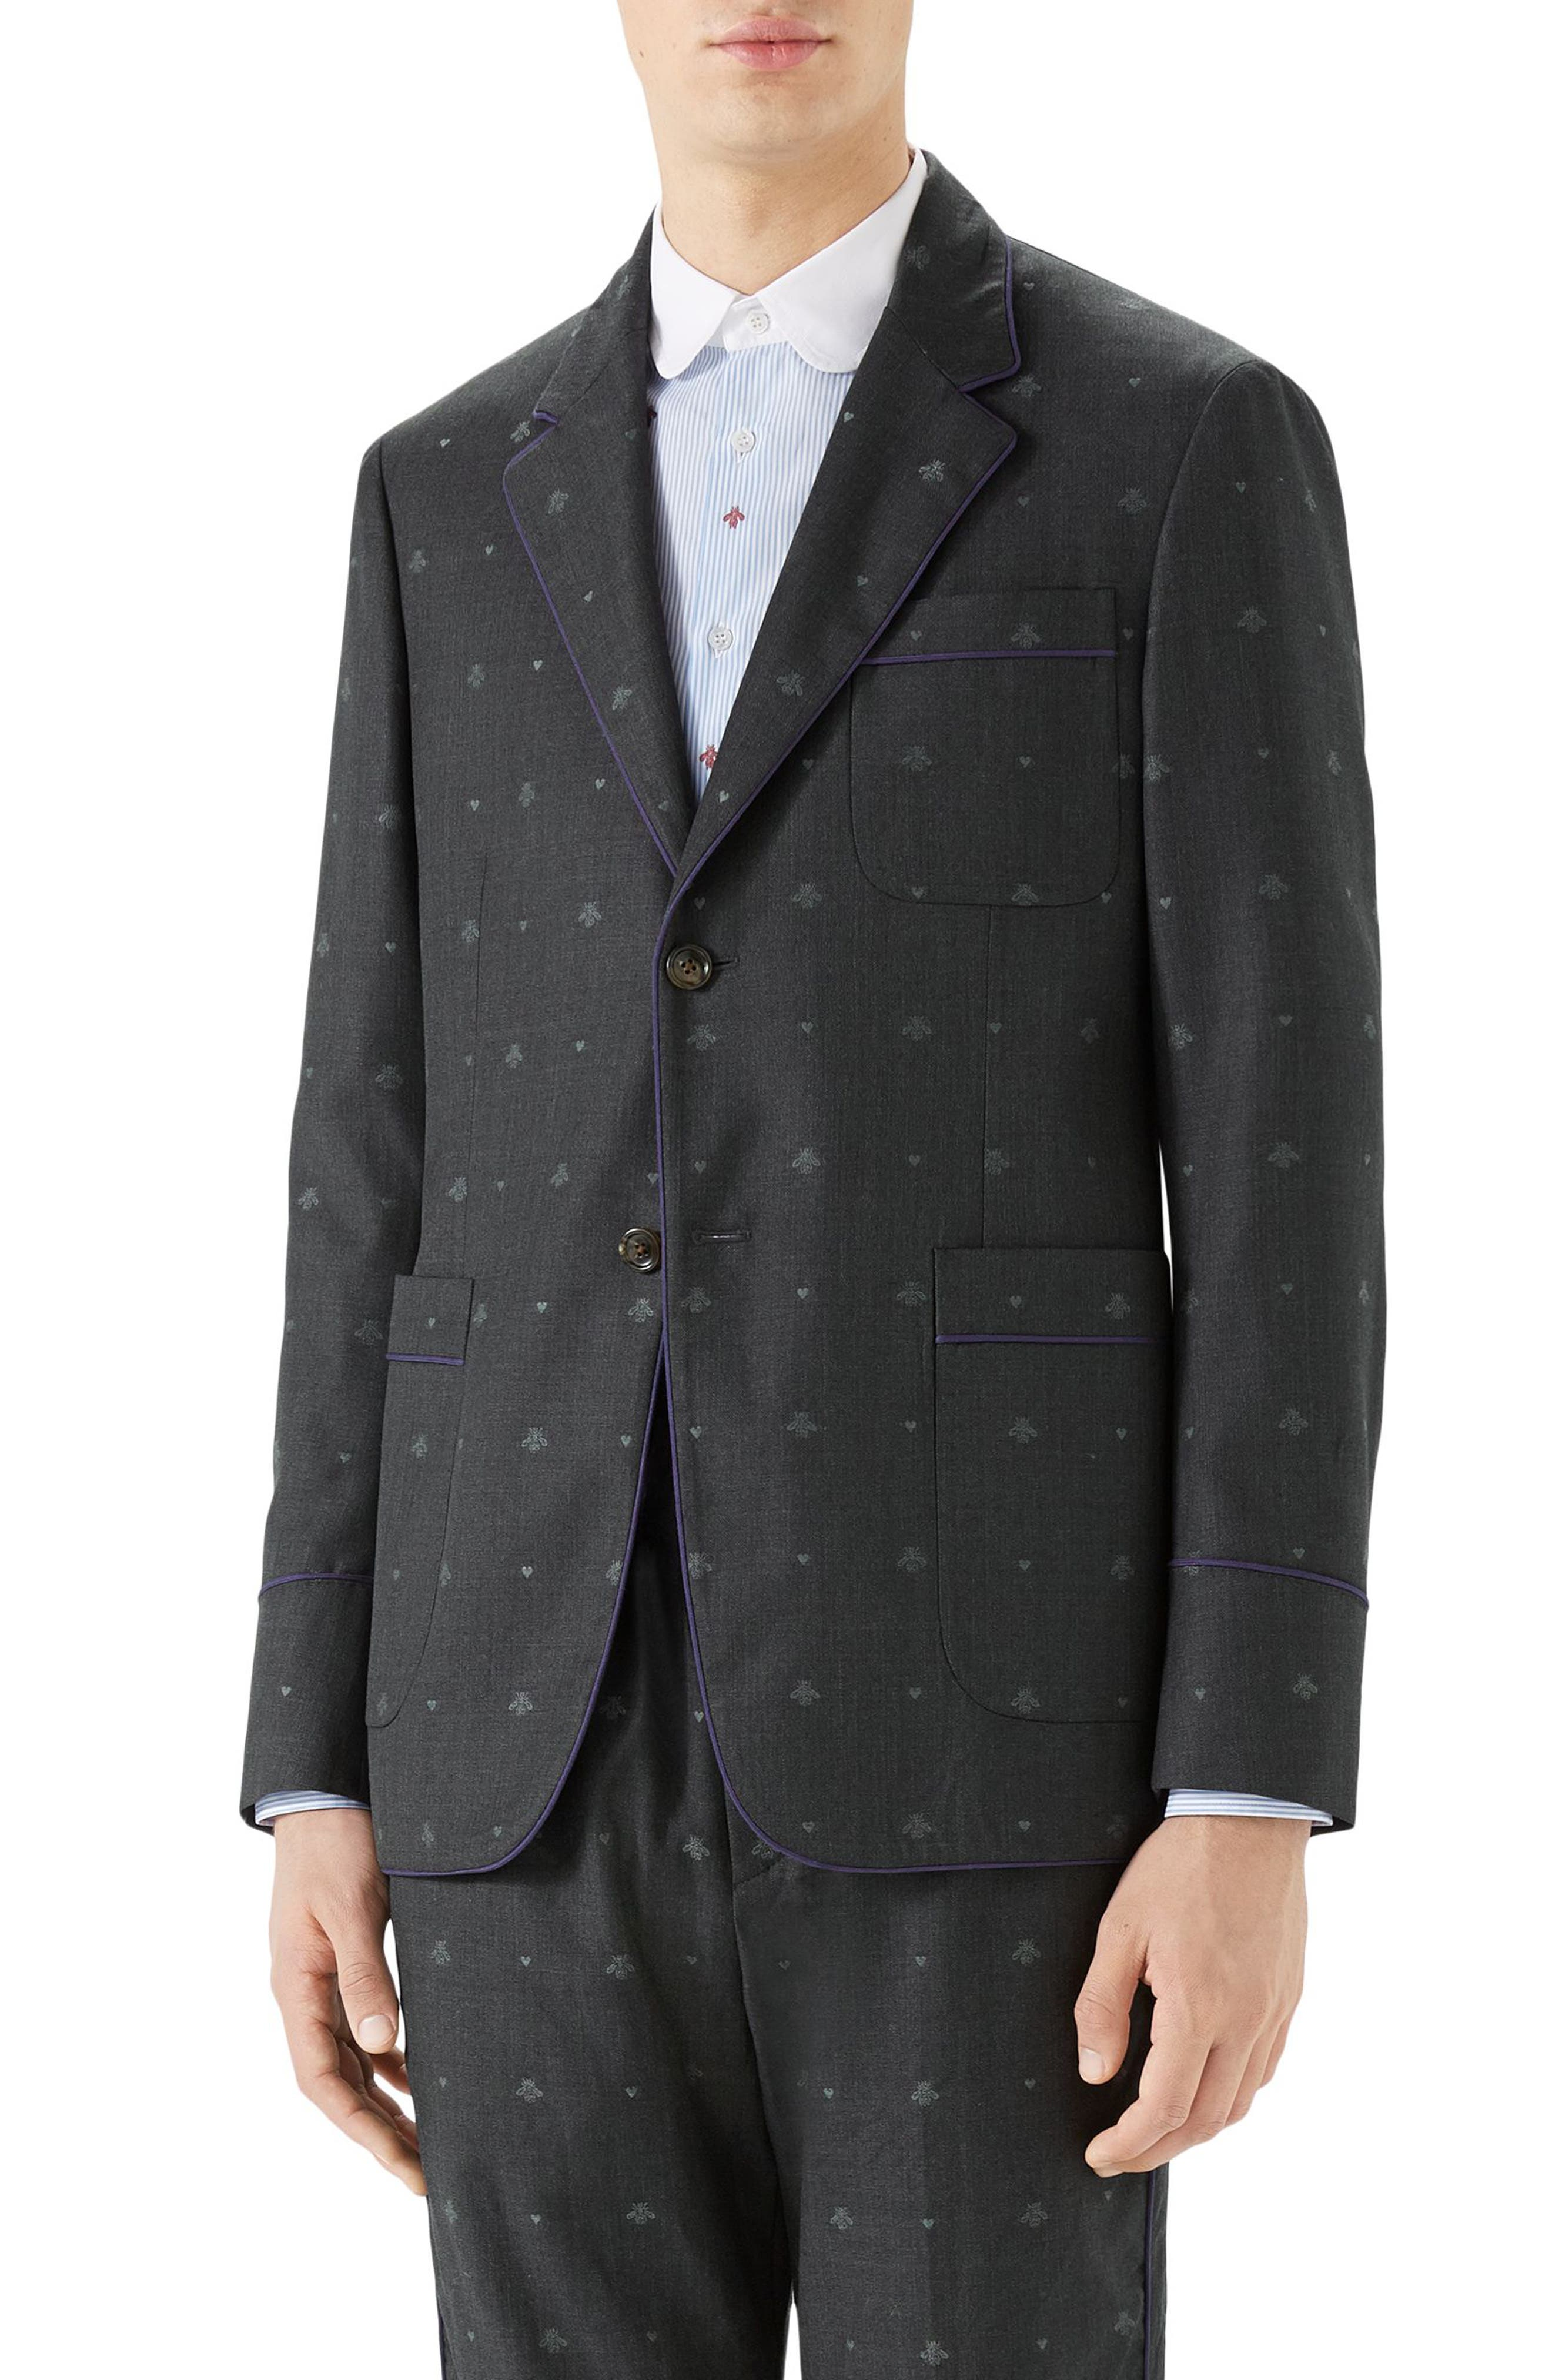 Bee & Heart Print Wool Sport Coat,                         Main,                         color, Dark Grey